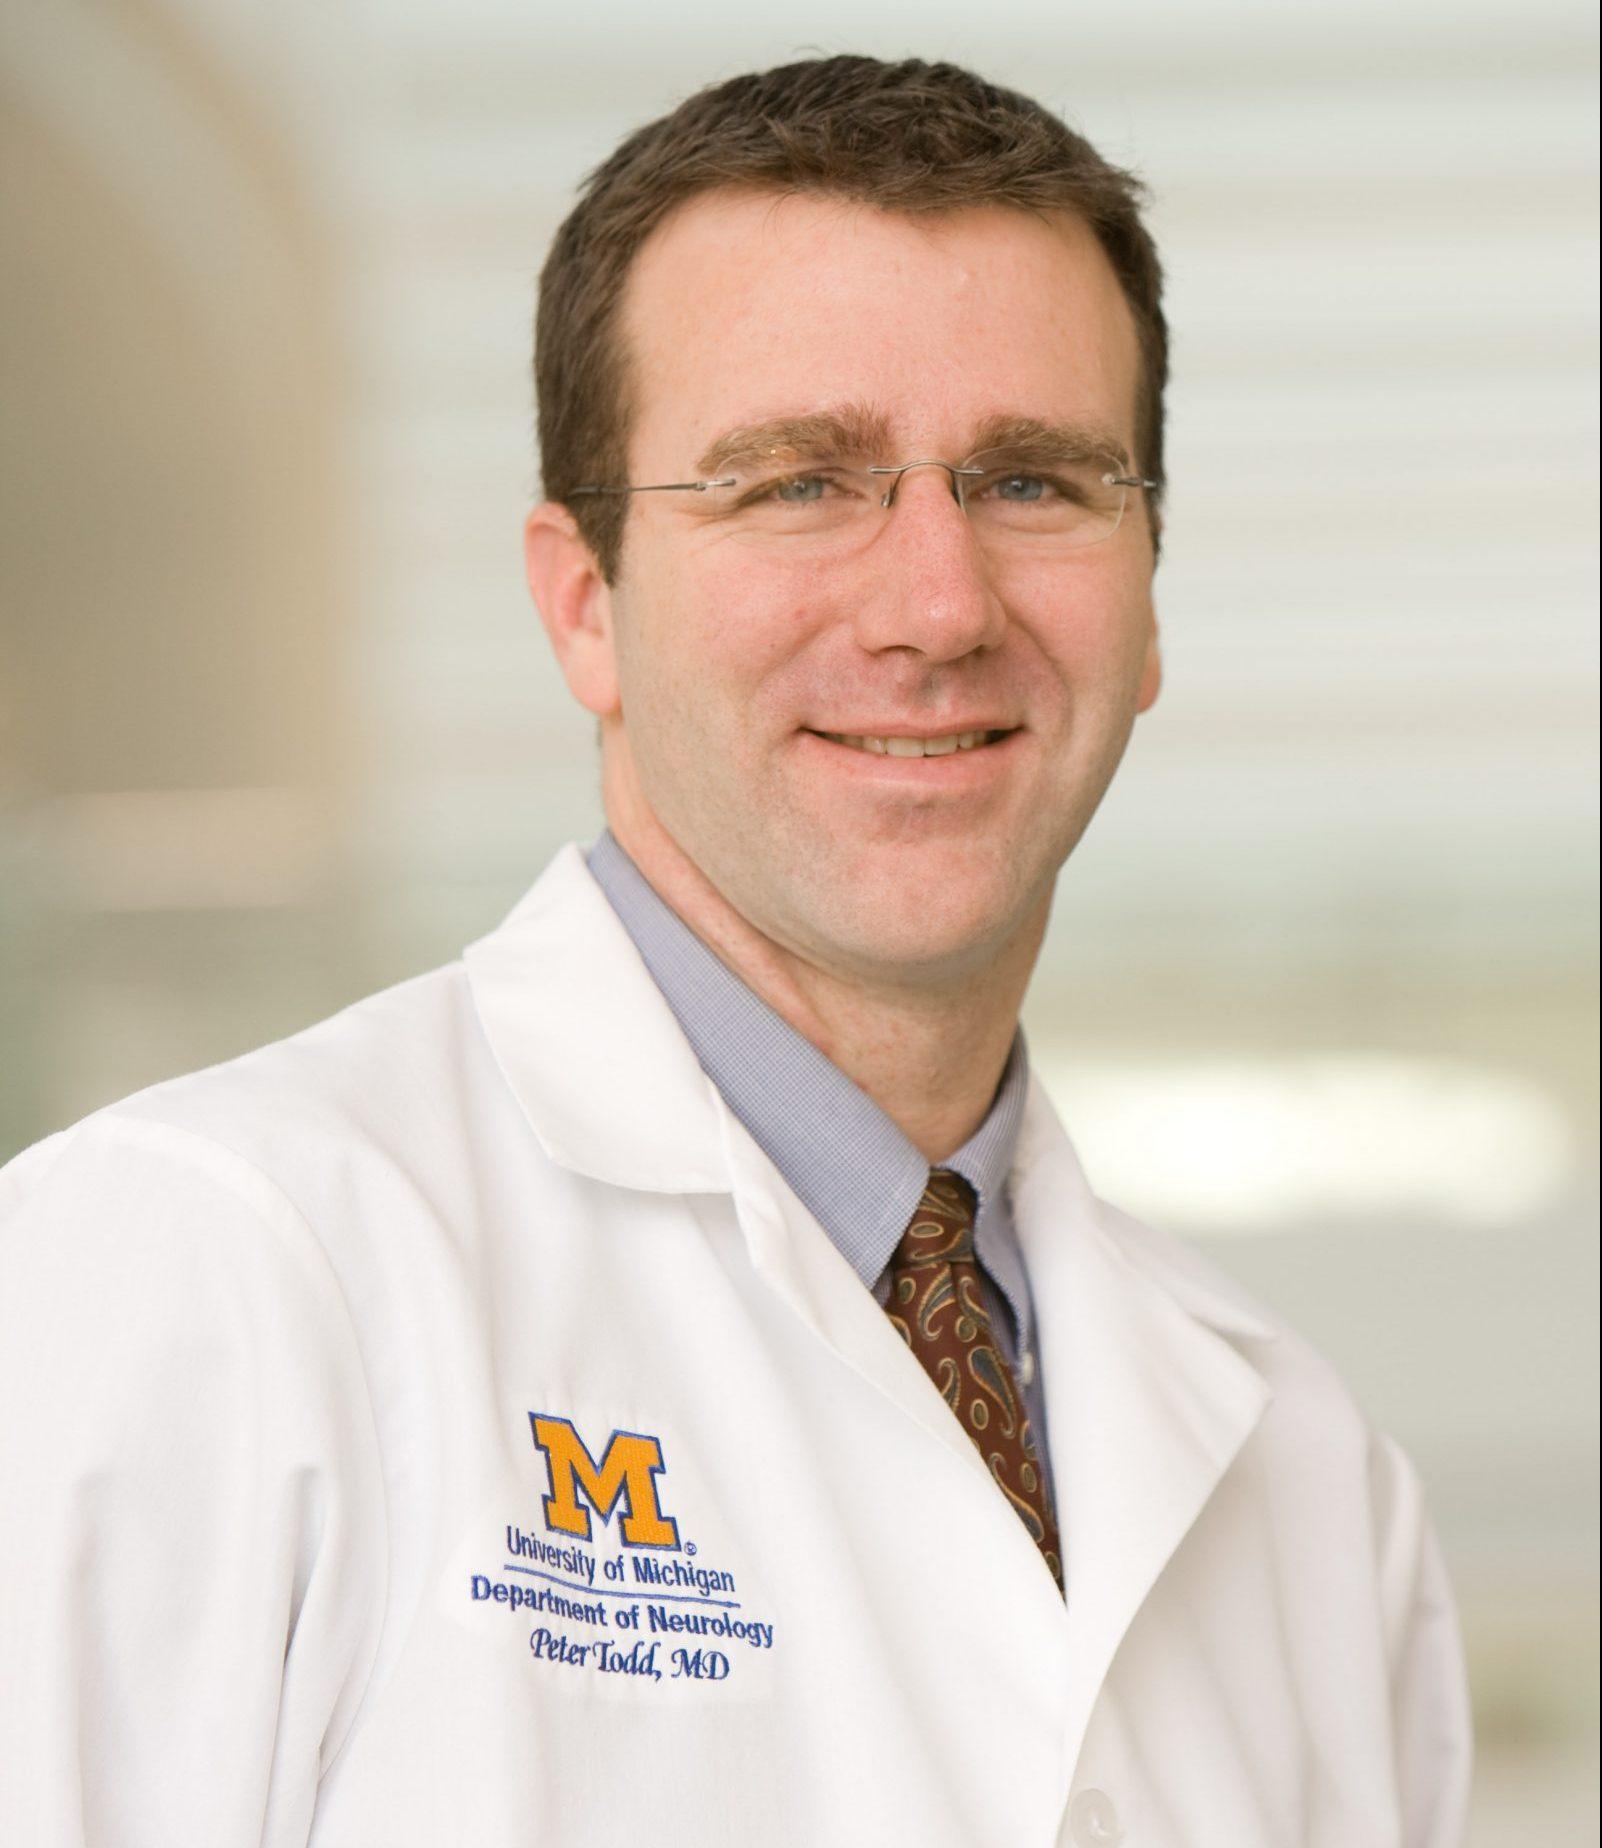 Dr. Peter Todd